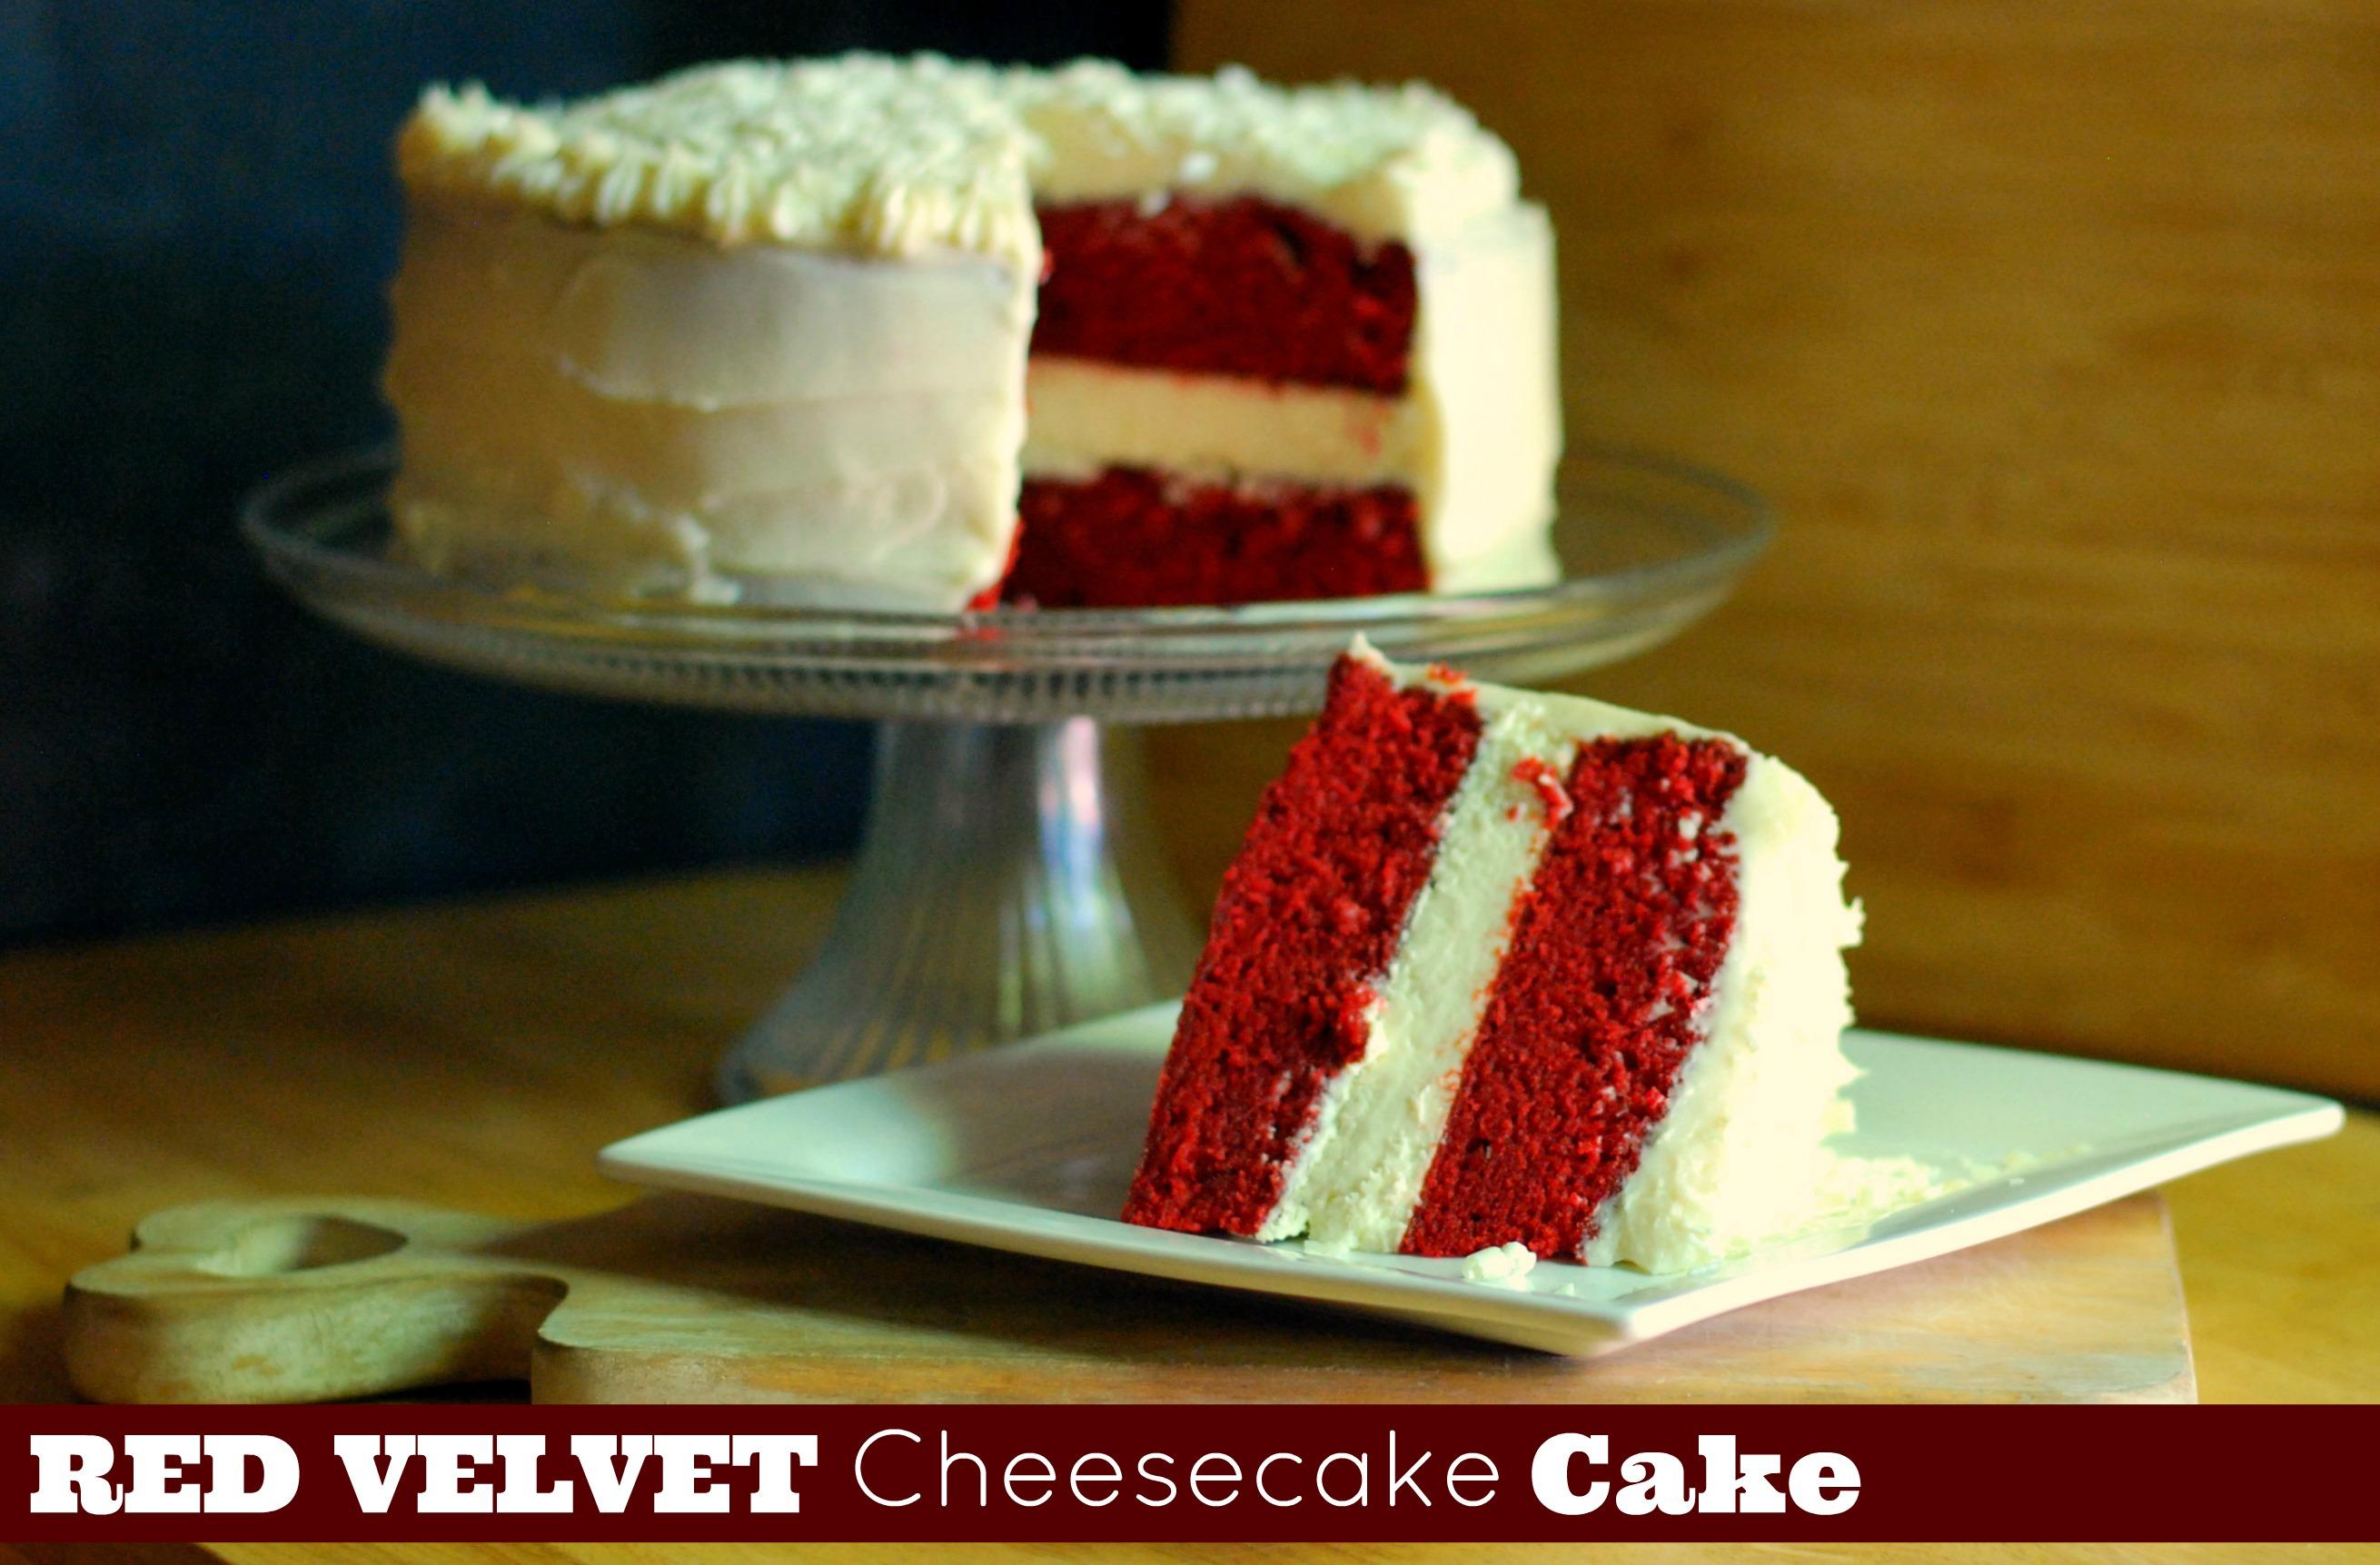 Red Velvet Cheesecake Cake - Aunt Bee's Recipes